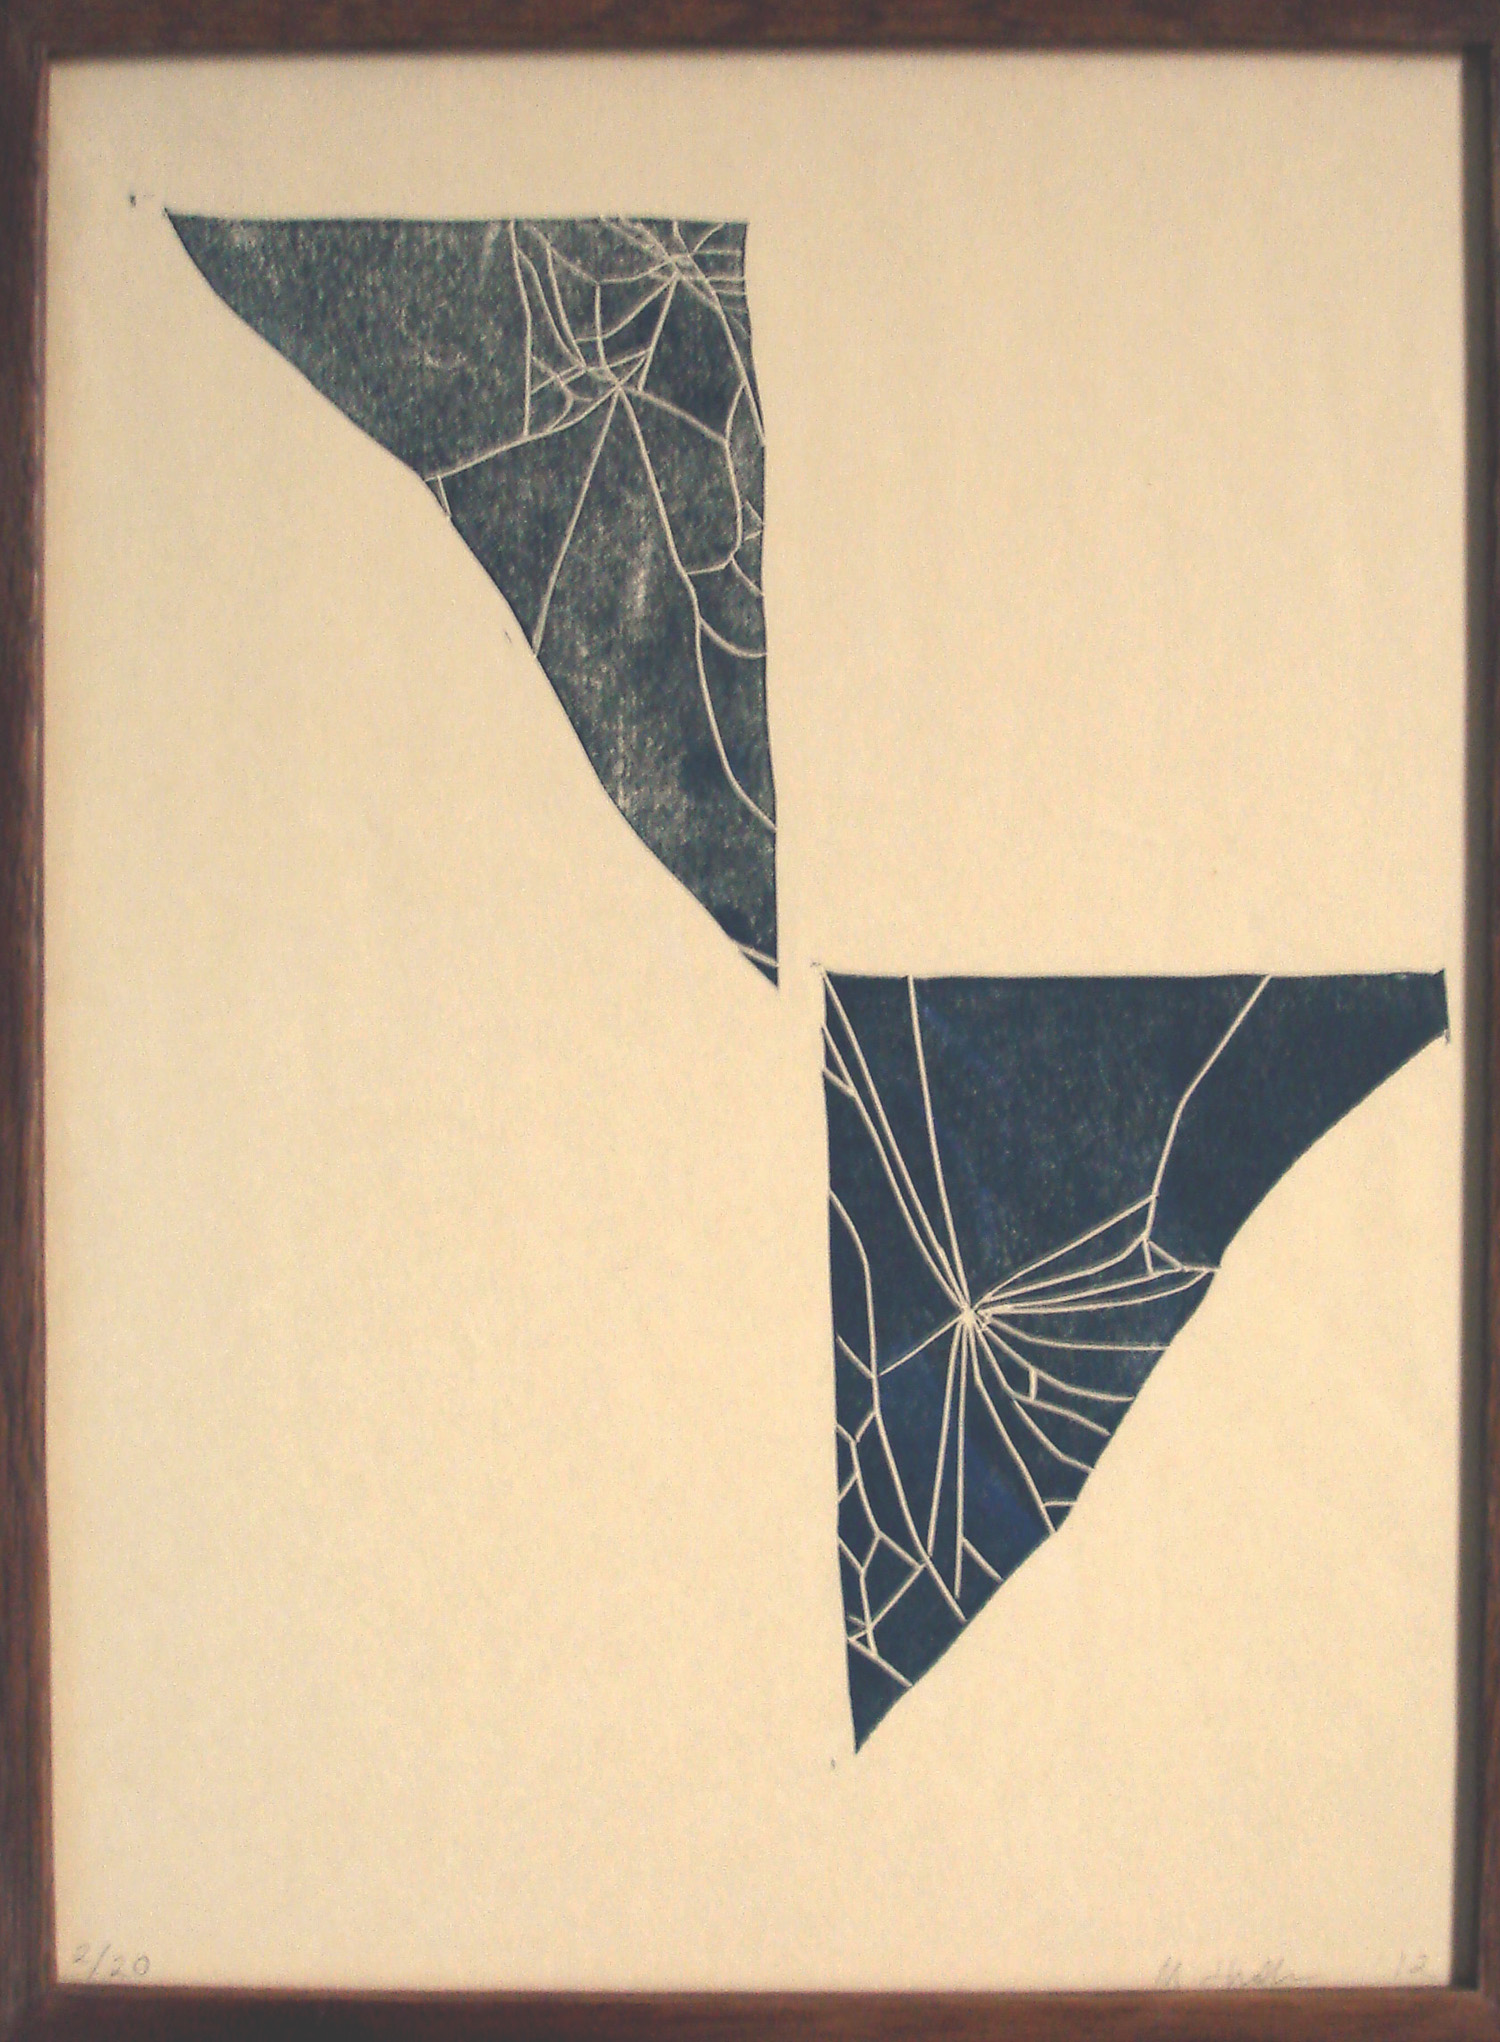 Webs    2012, lino print, 31 x 23cm